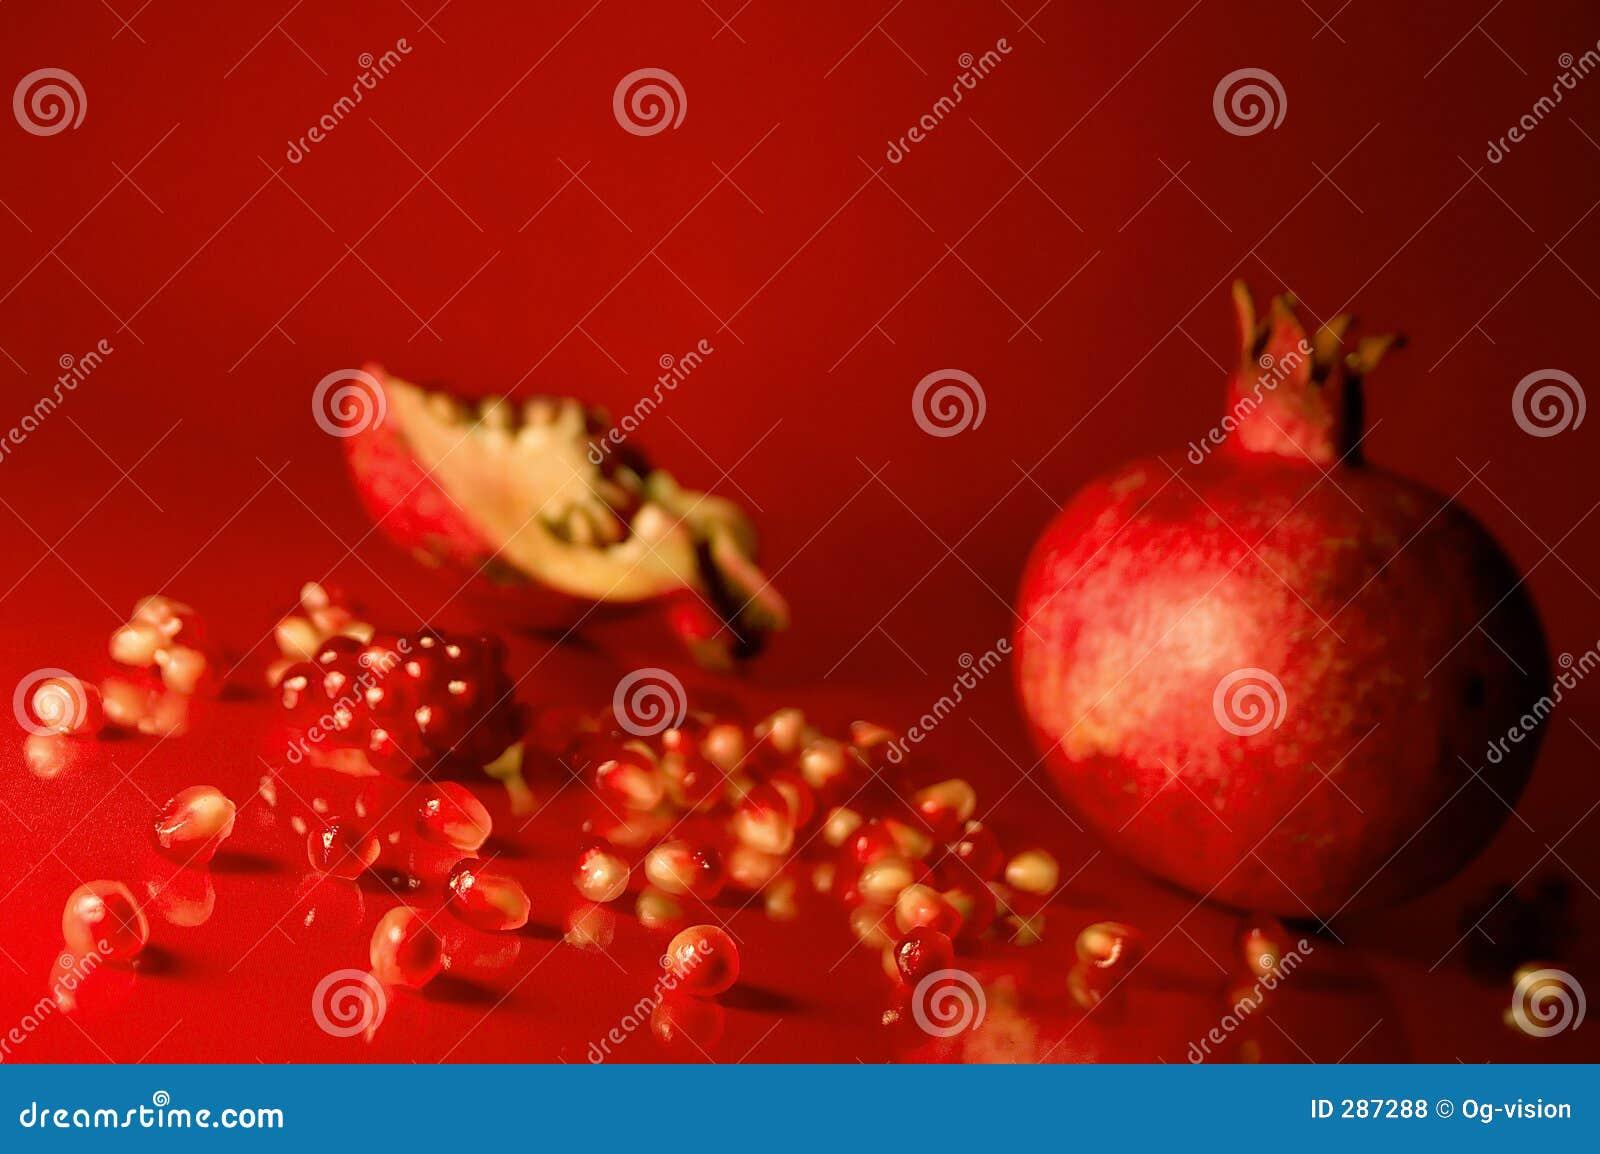 how to prepare pomegranate seeds